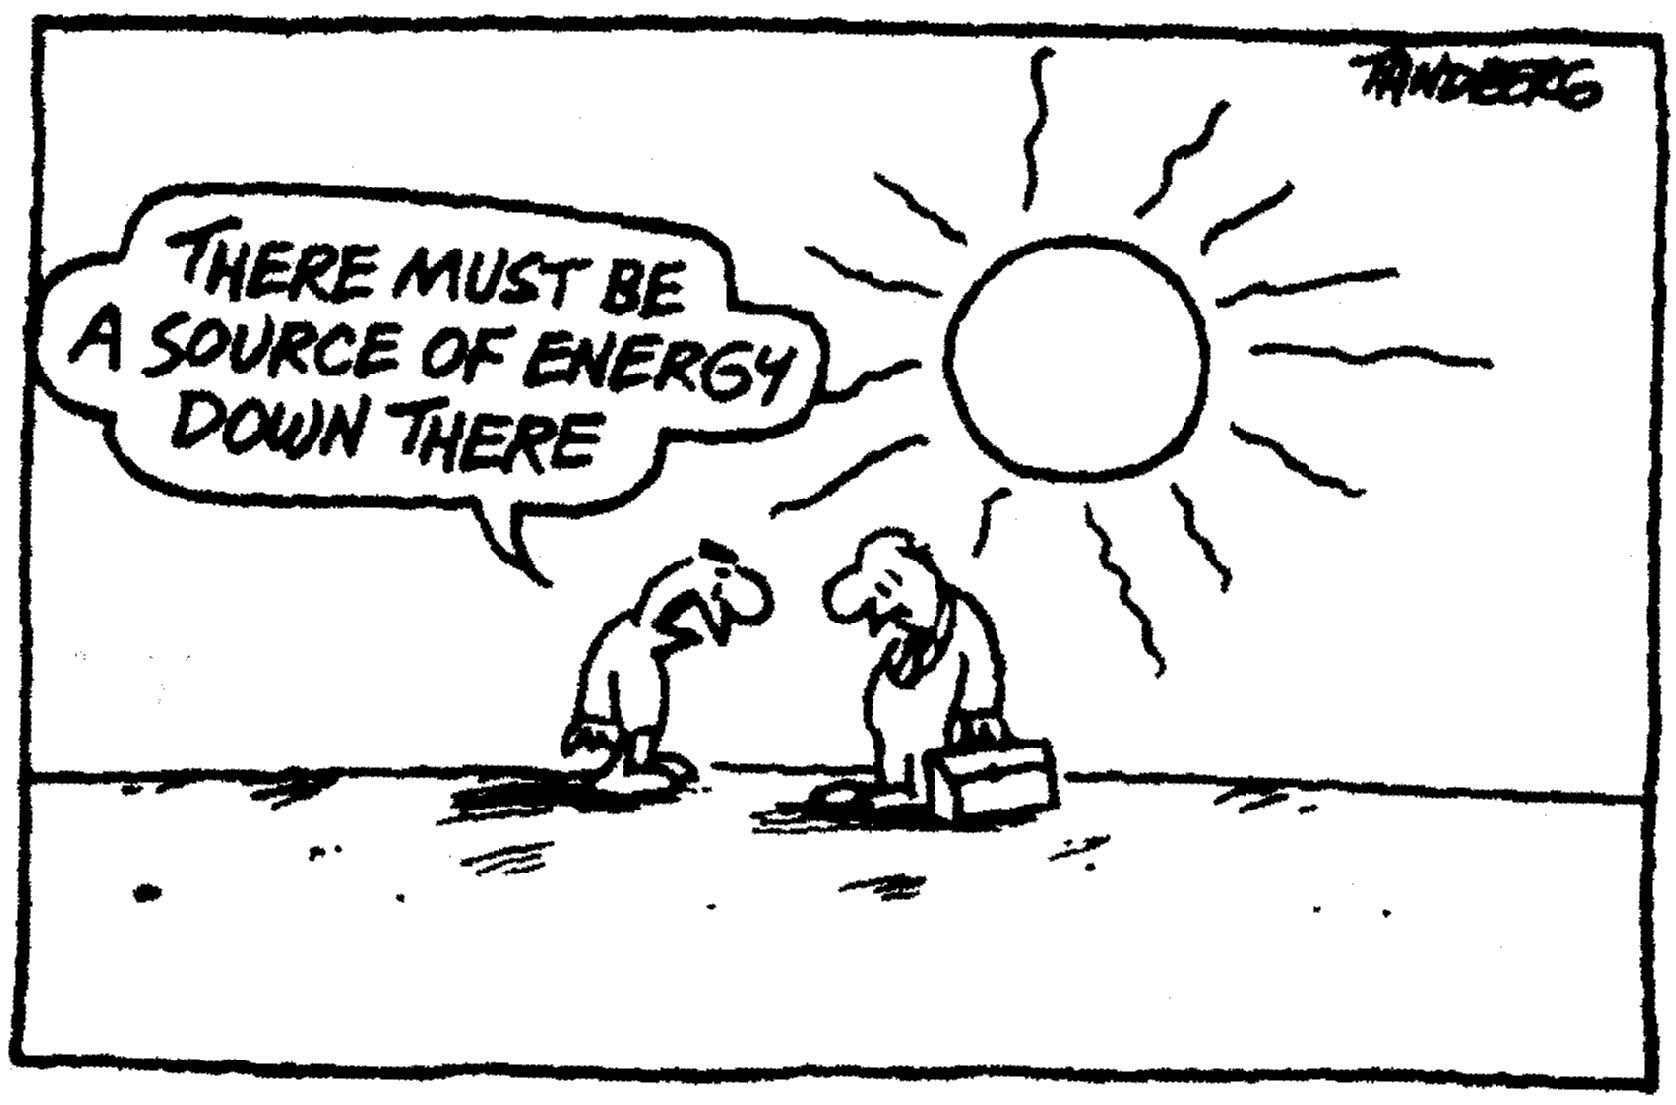 energy_cartoon.jpg